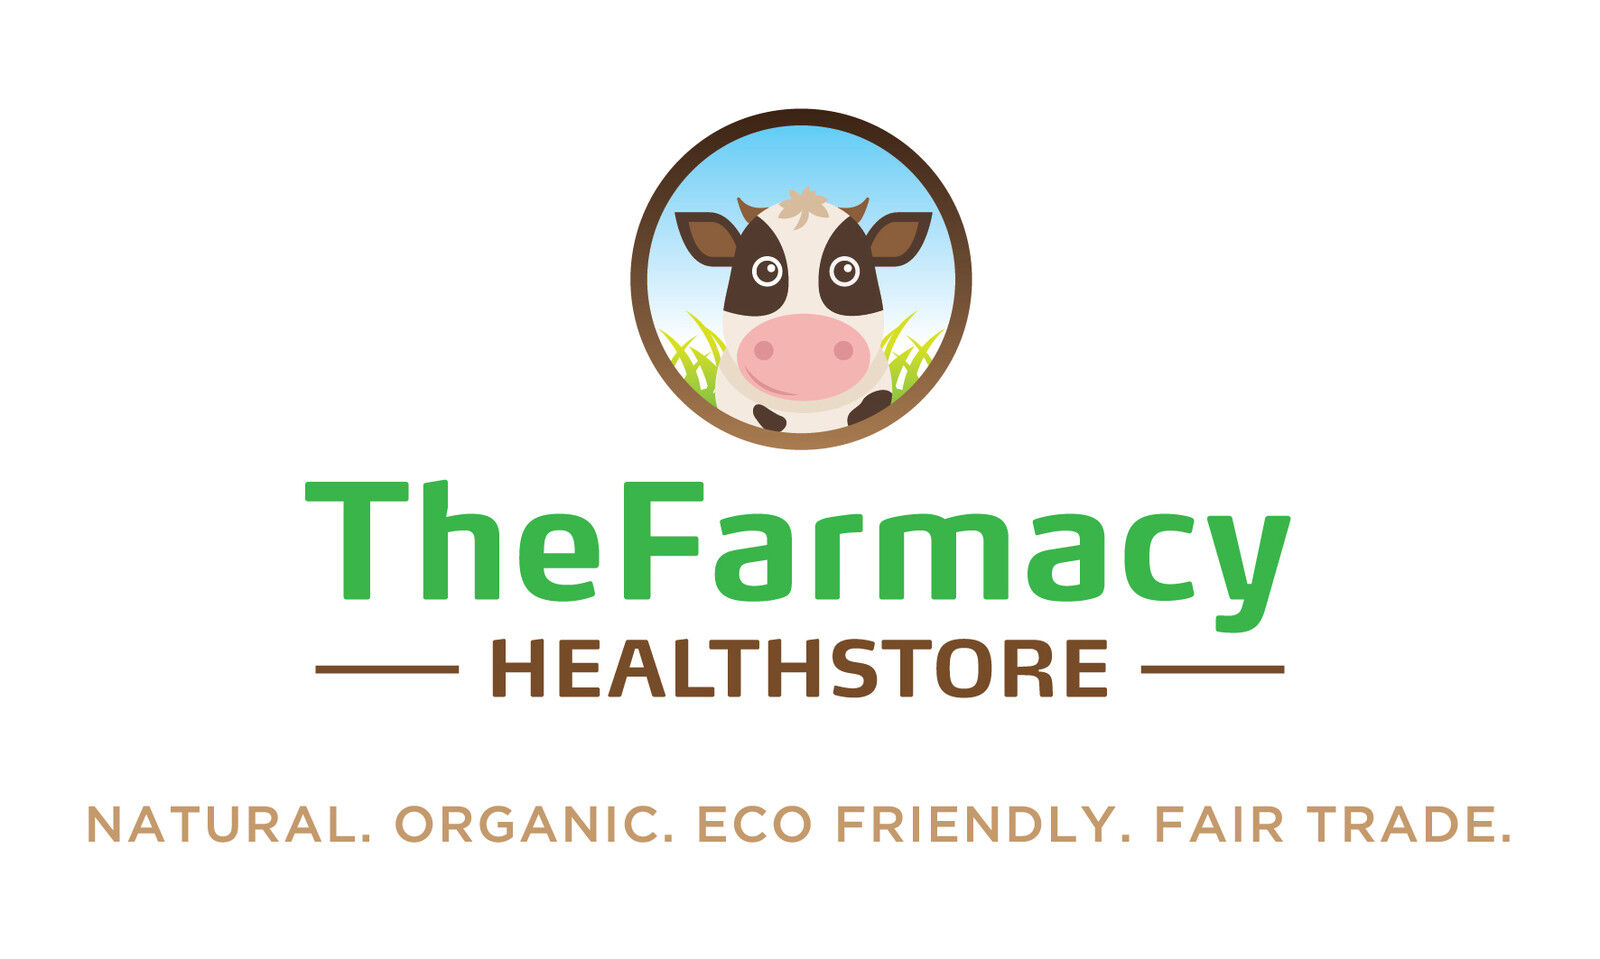 thefarmacyhealthstore